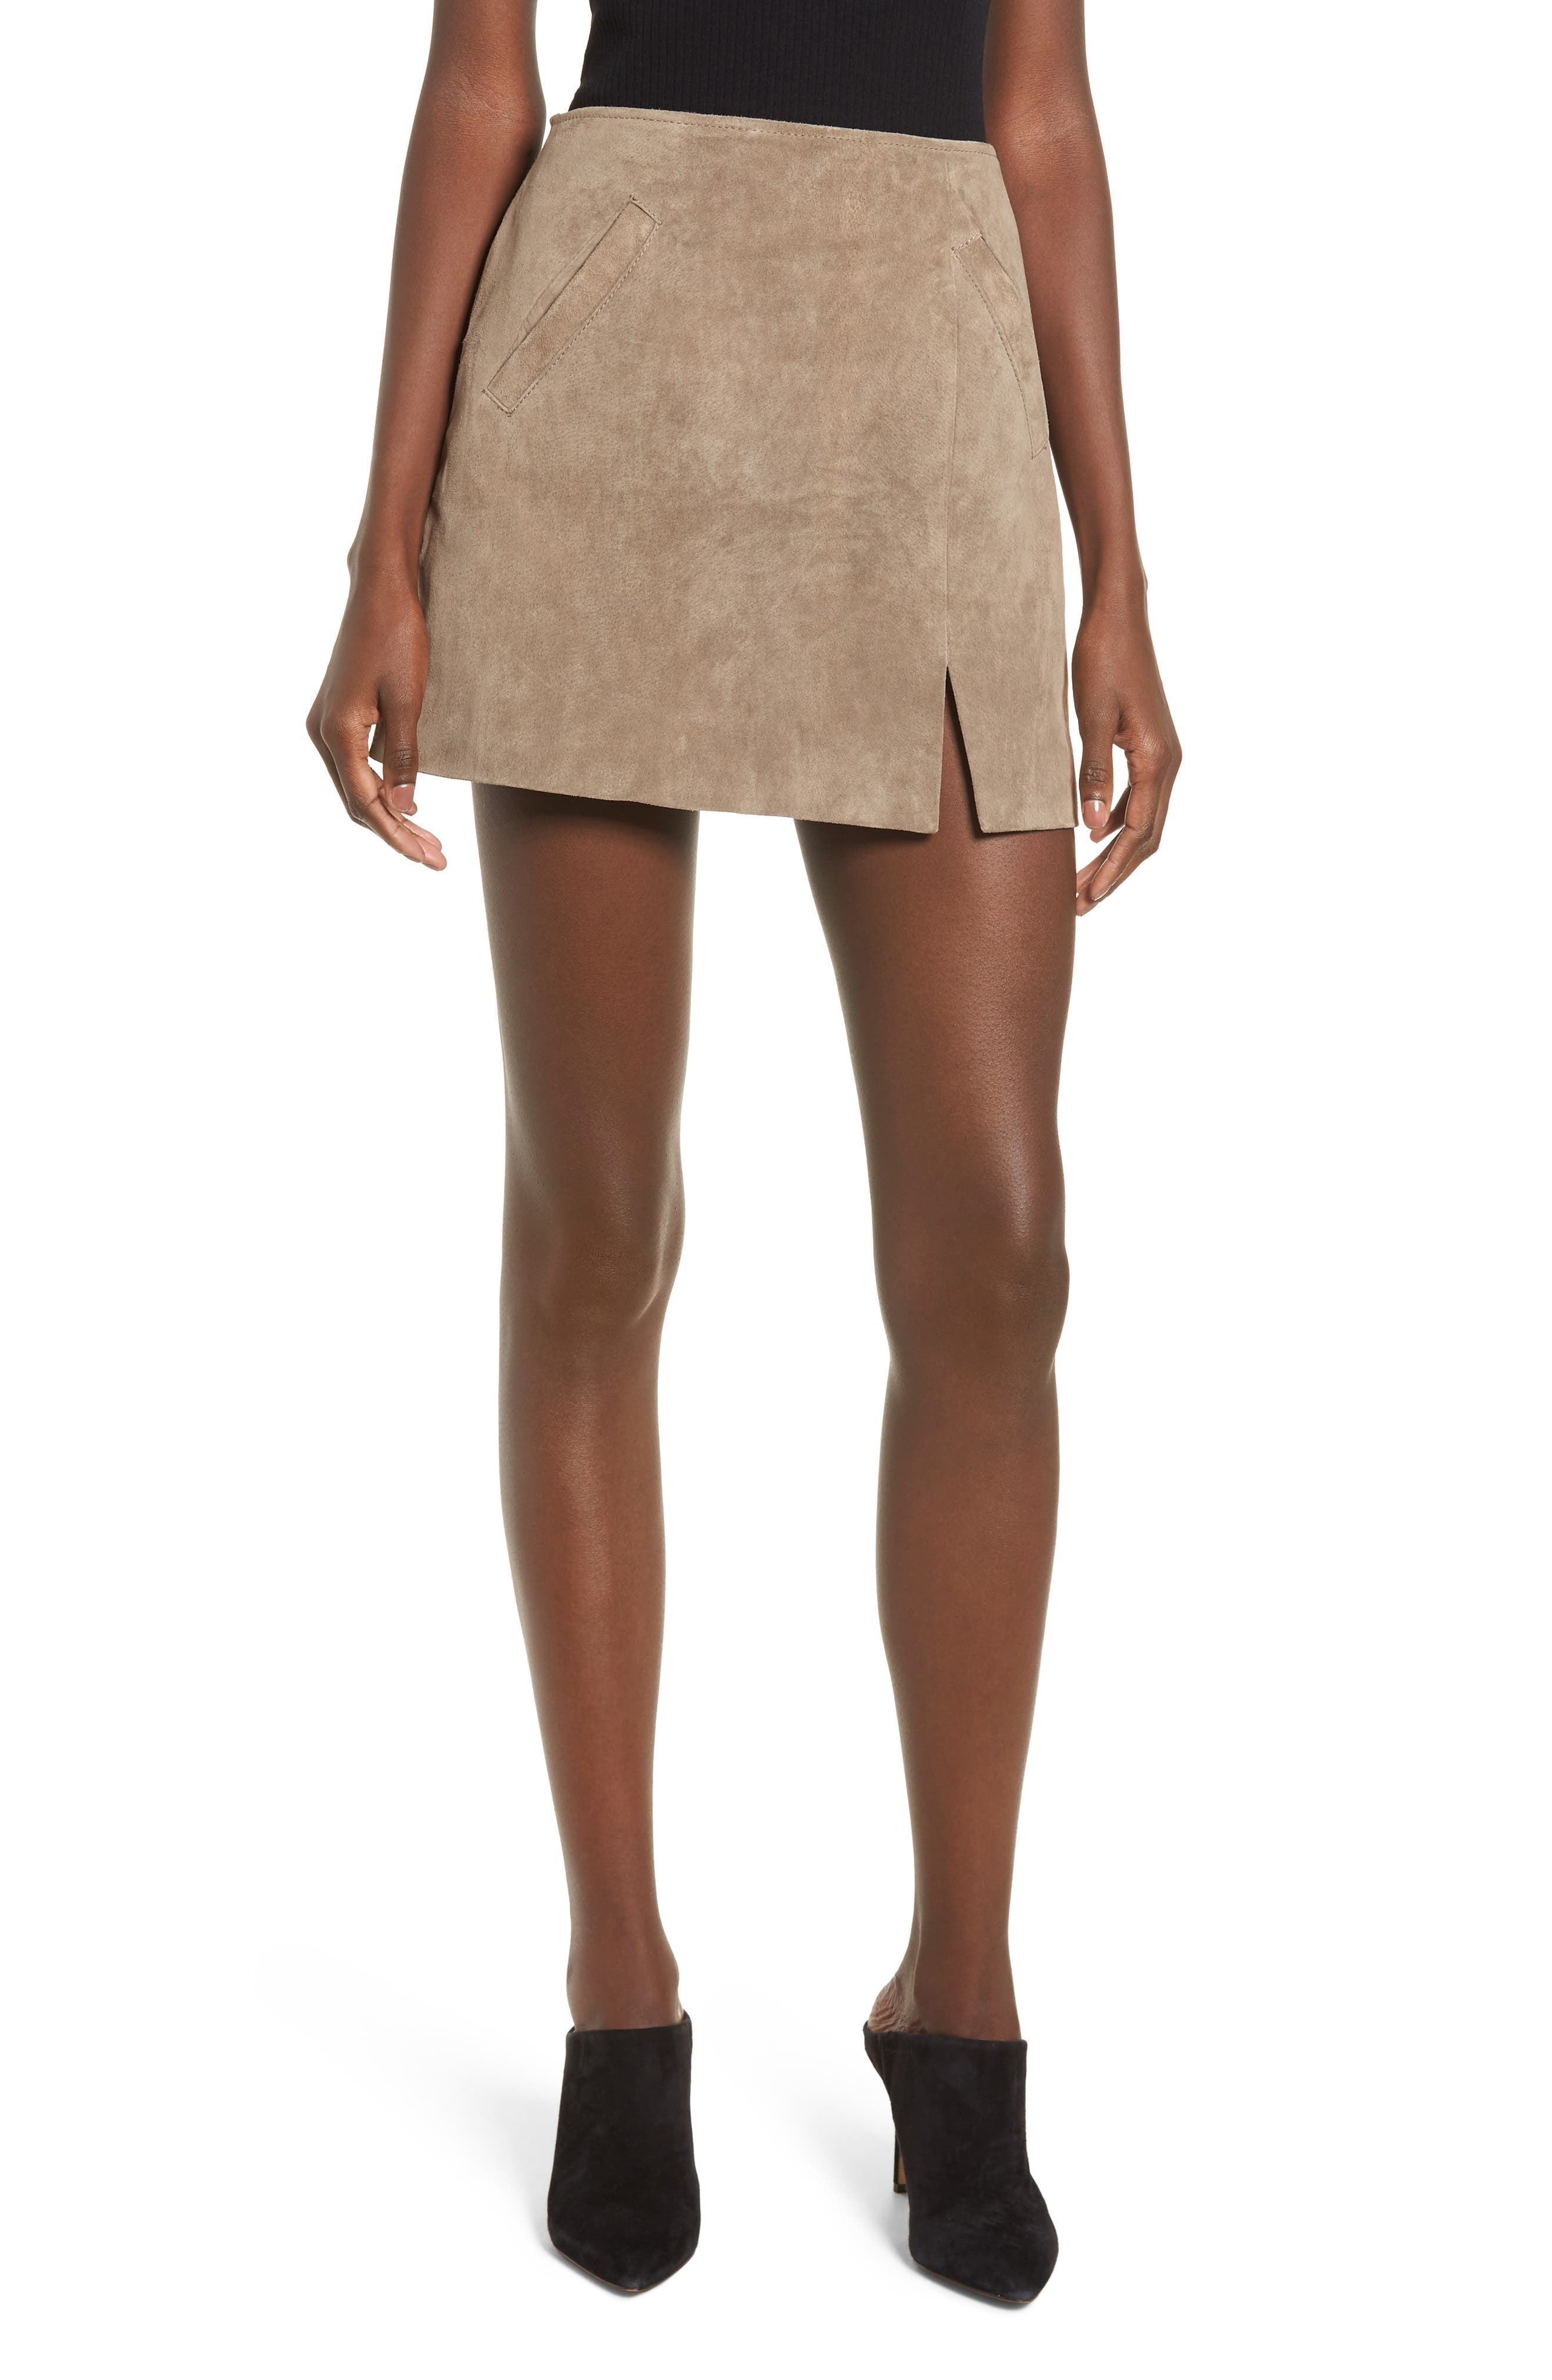 Blanknyc Suede Miniskirt, Beige